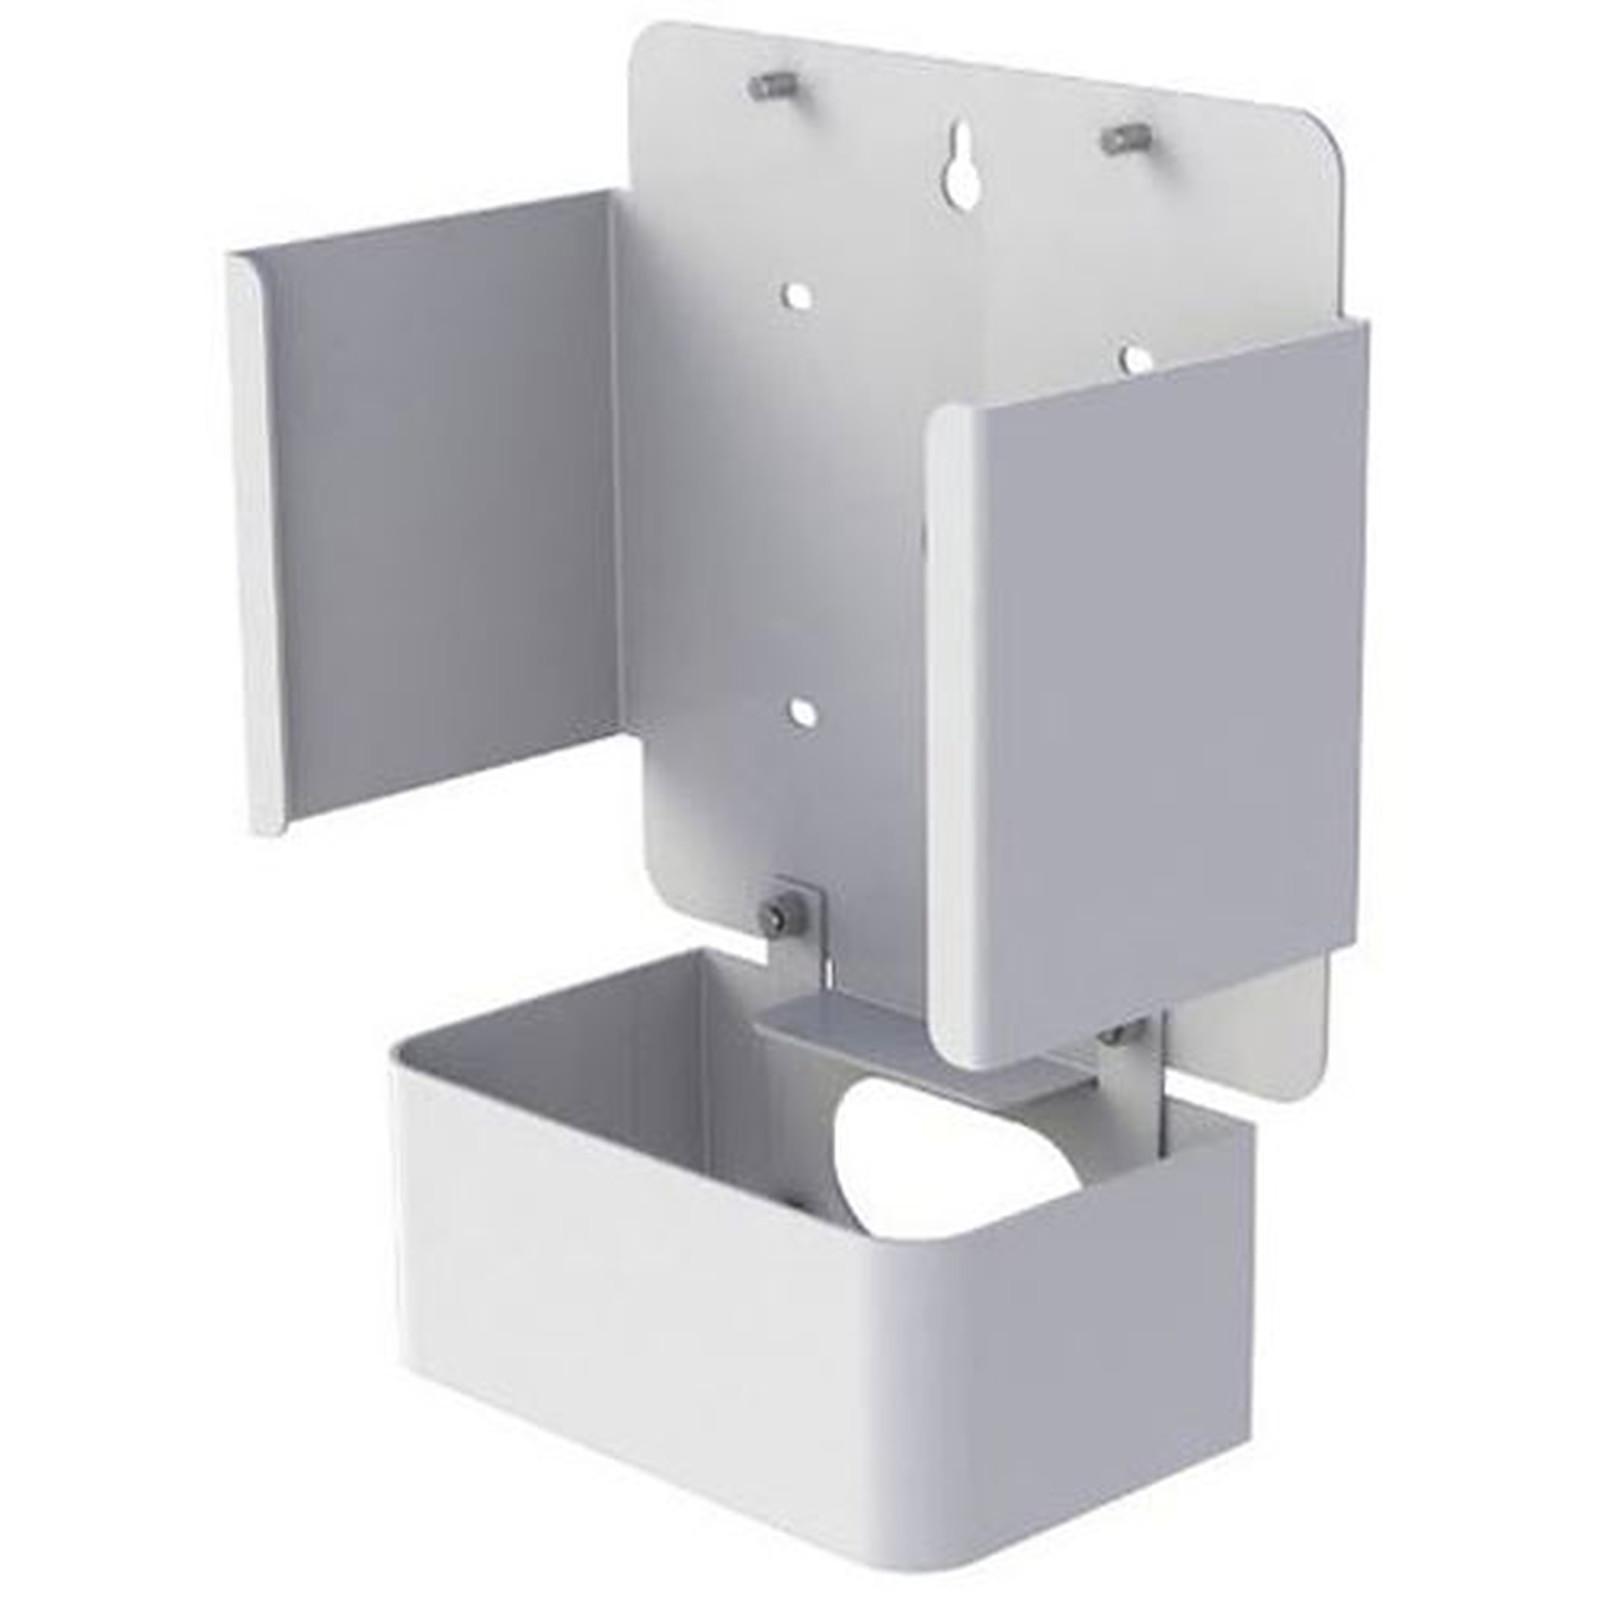 Flexson Bracket Sonos CONNECT Wall Mount Blanc